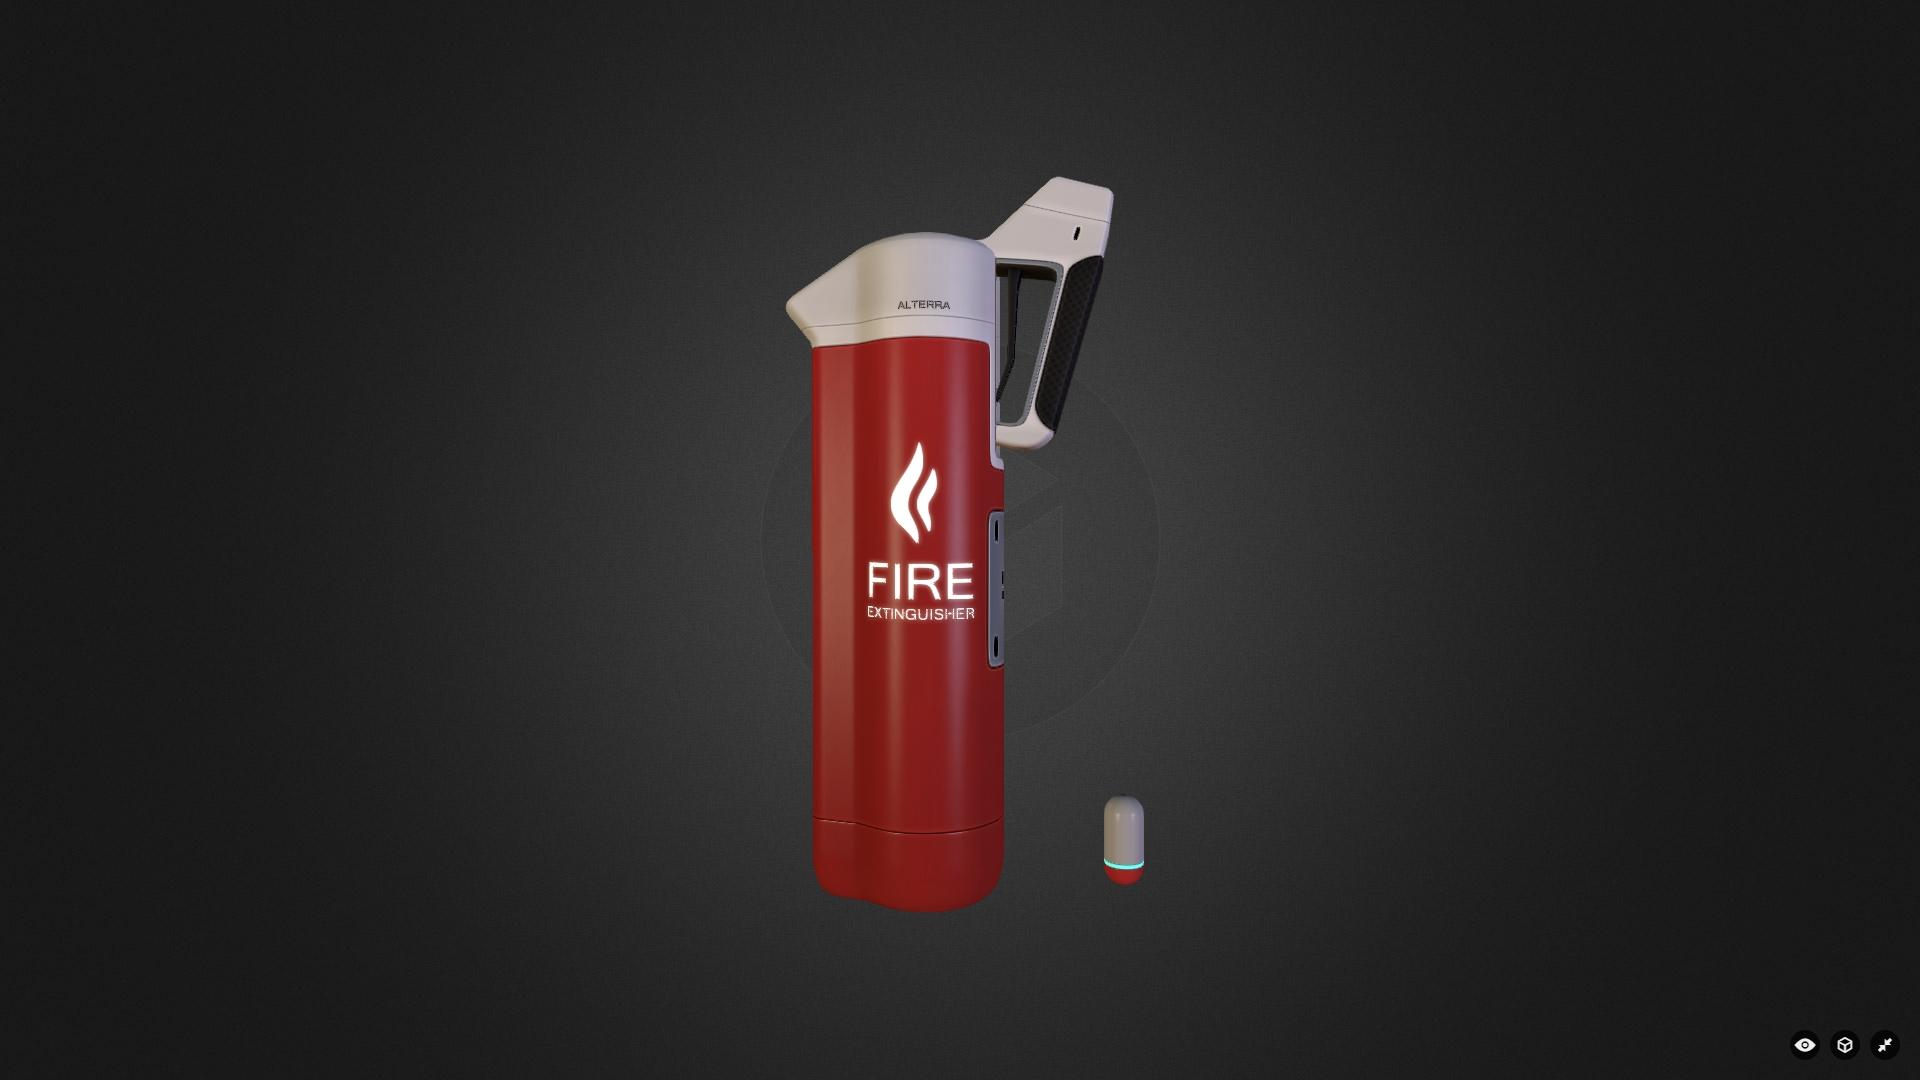 Fire Extinguisher Model